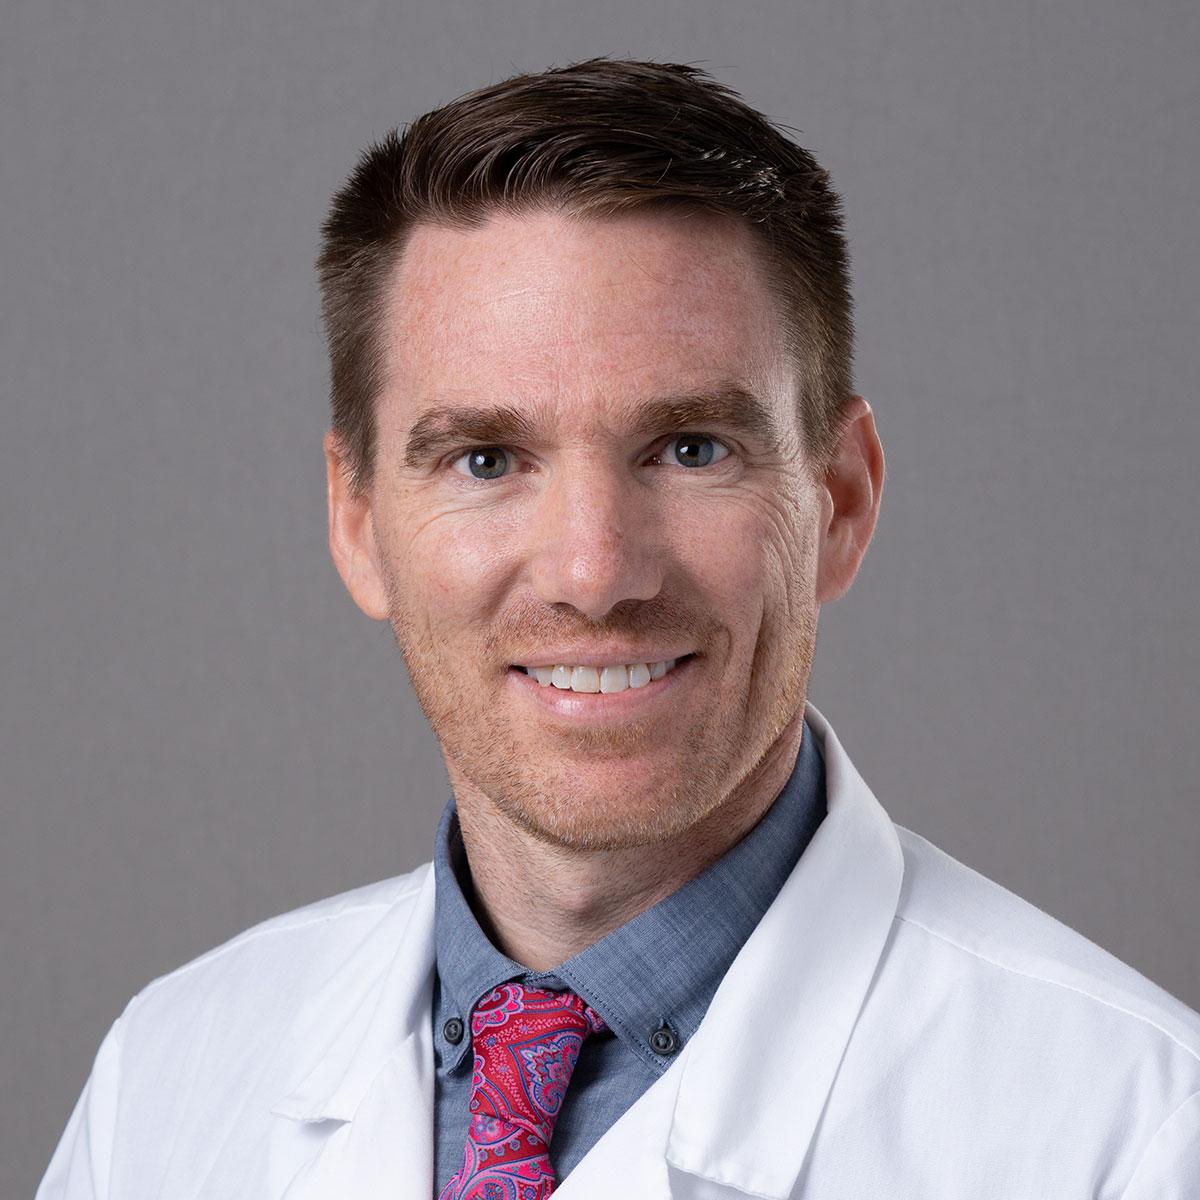 A friendly headshot of Dr. Jamin Grahm